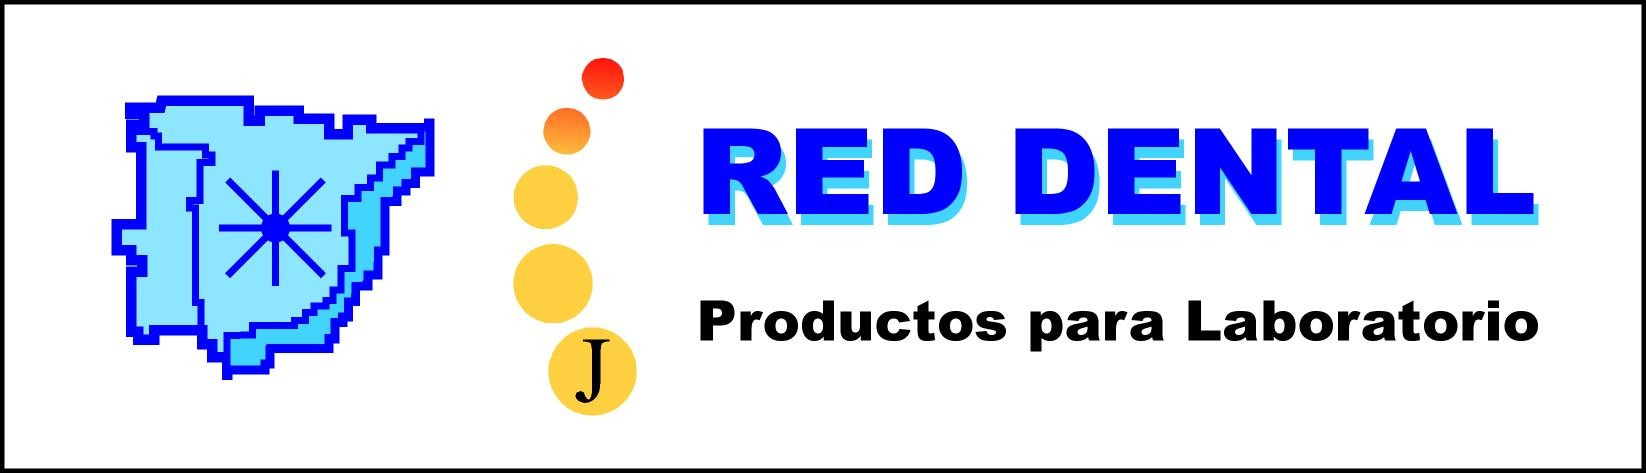 Red Dental